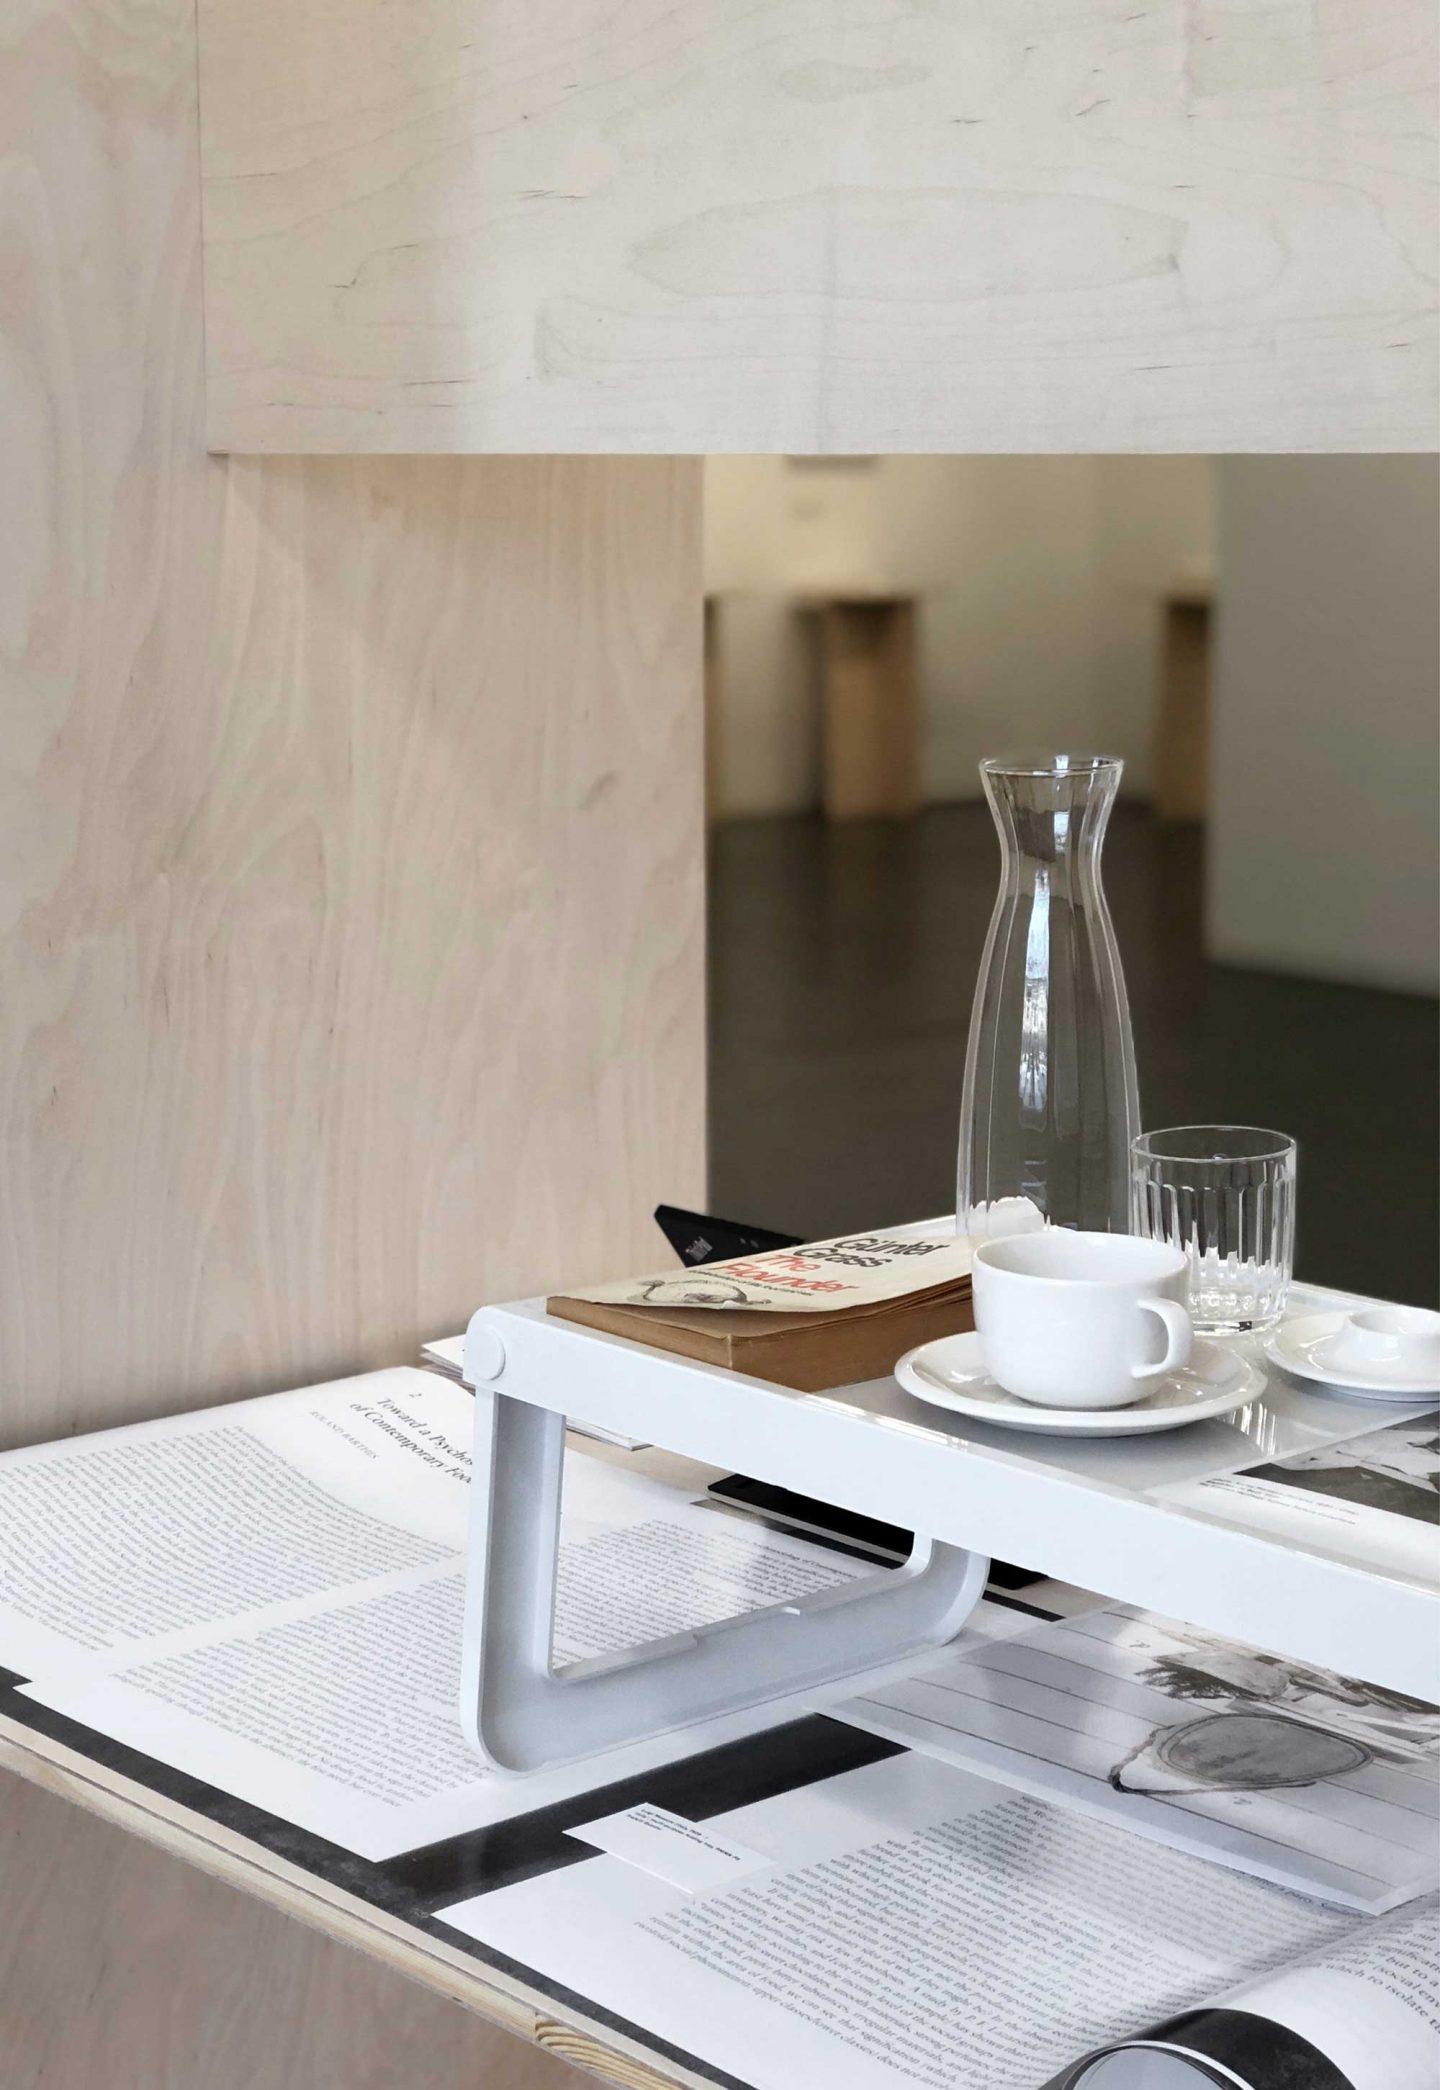 Highlights from Stockholm Design Week, Swedish design, Finnish design, Iittala, Jasper Morrison